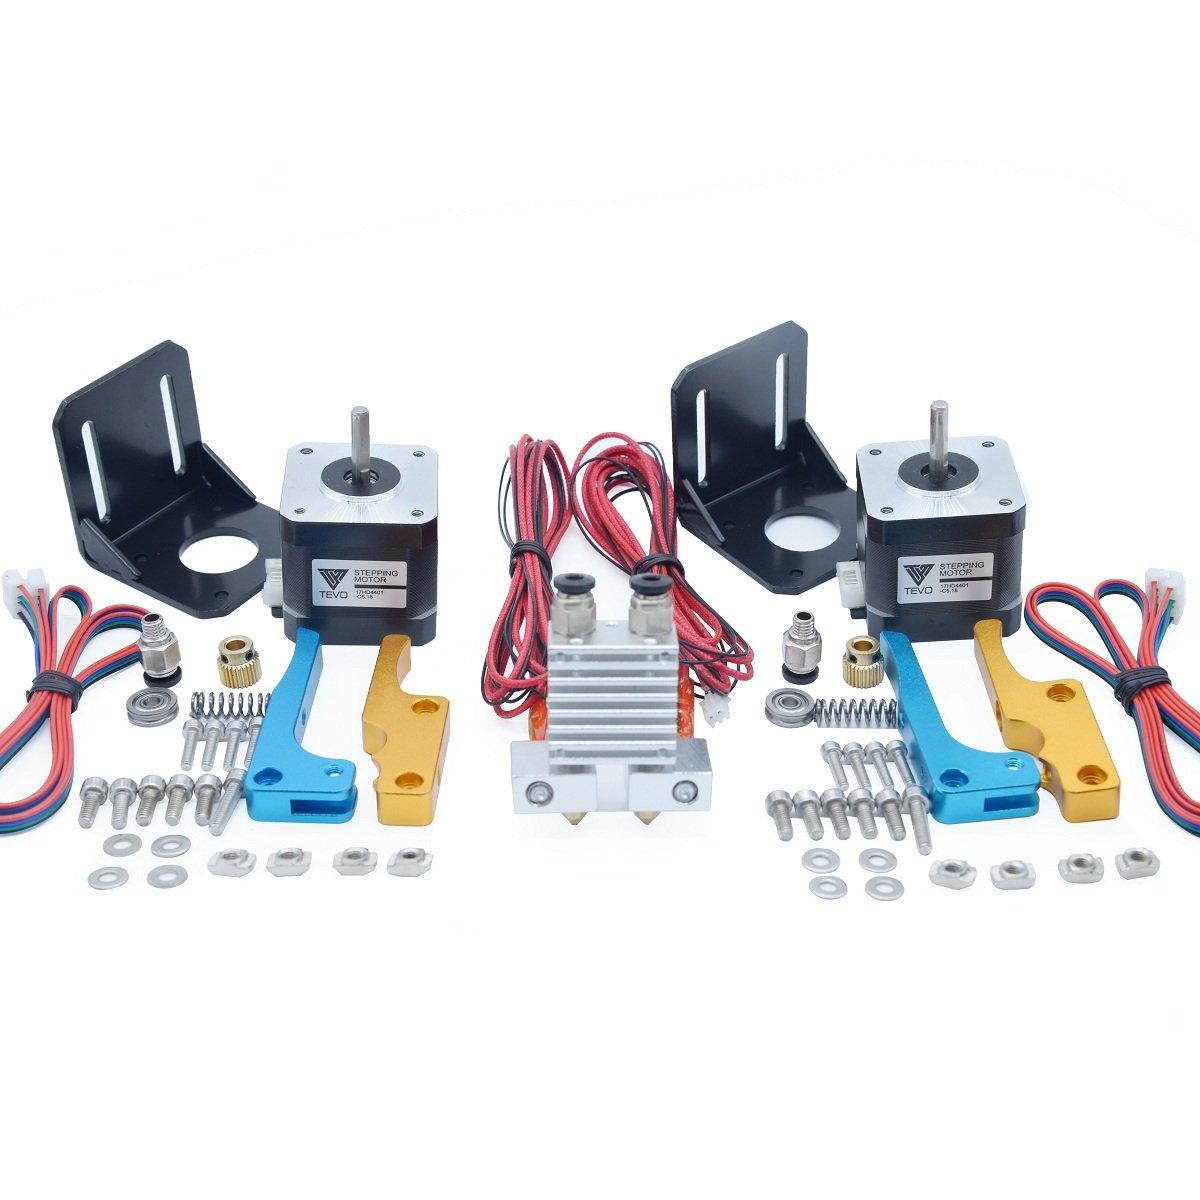 3d impresora parte Tevo tarántula doble extrusor Upgrade ...